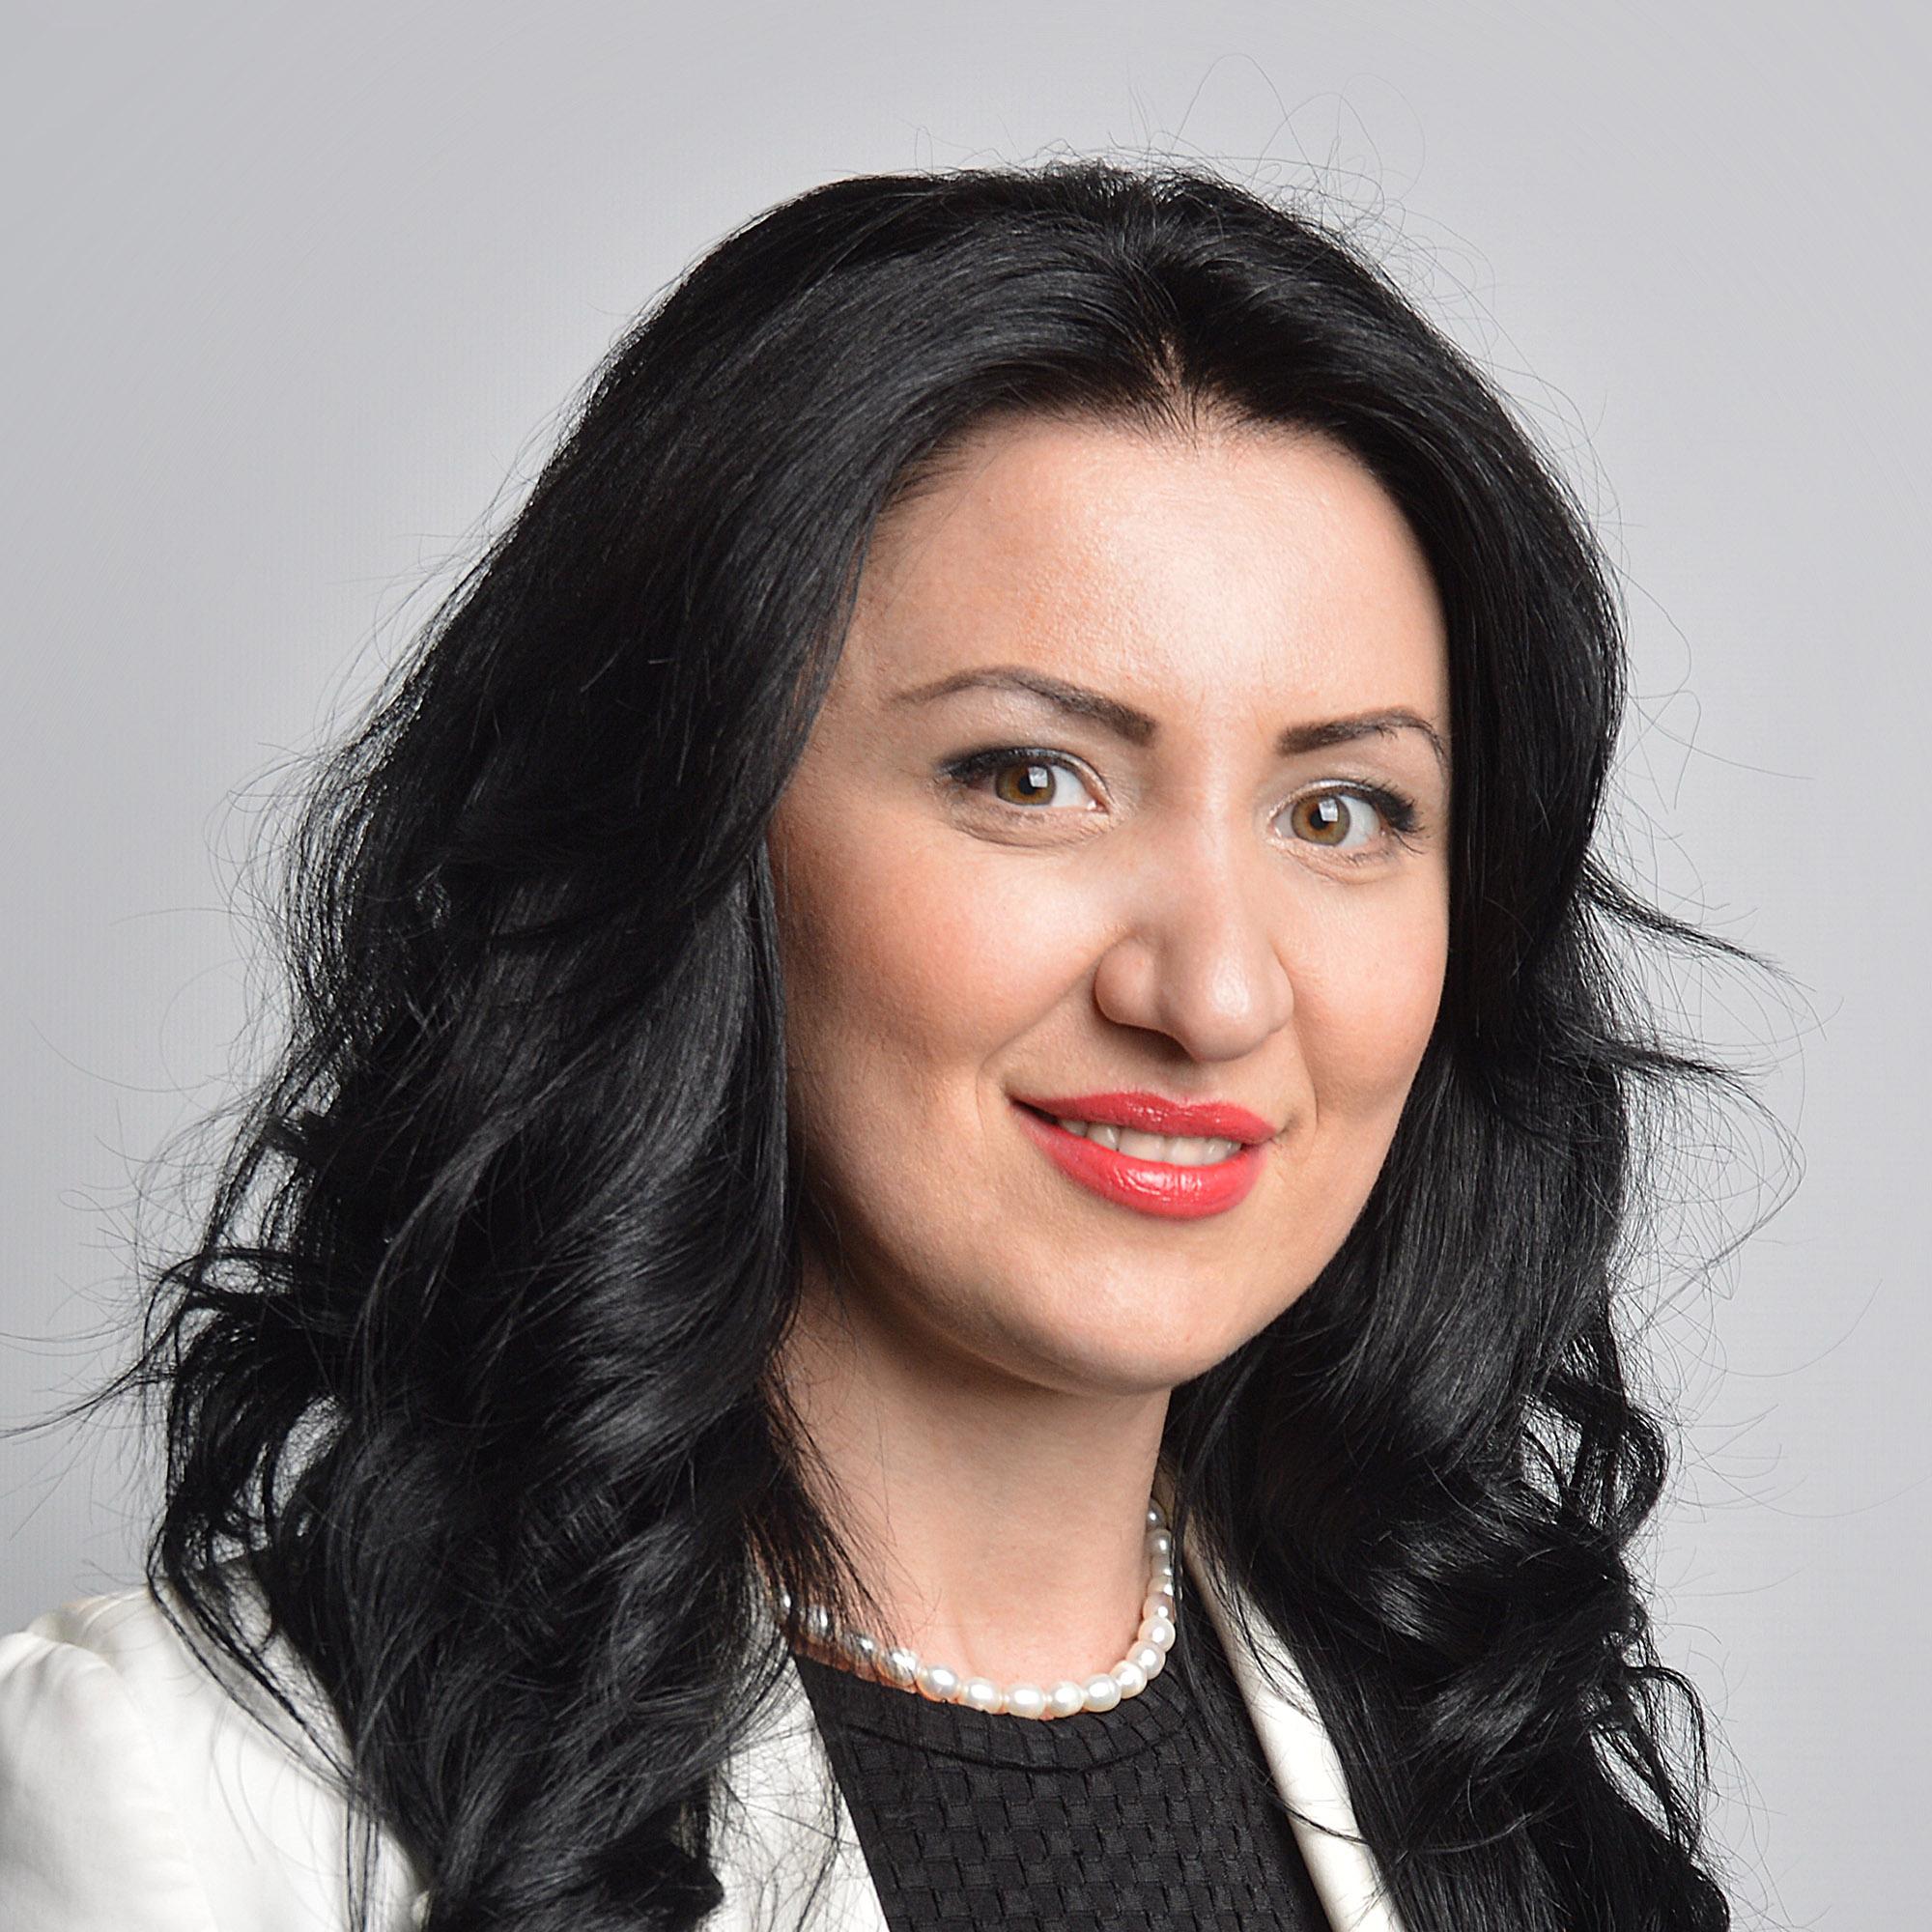 Nicoleta-Annemarie MUNTEANU